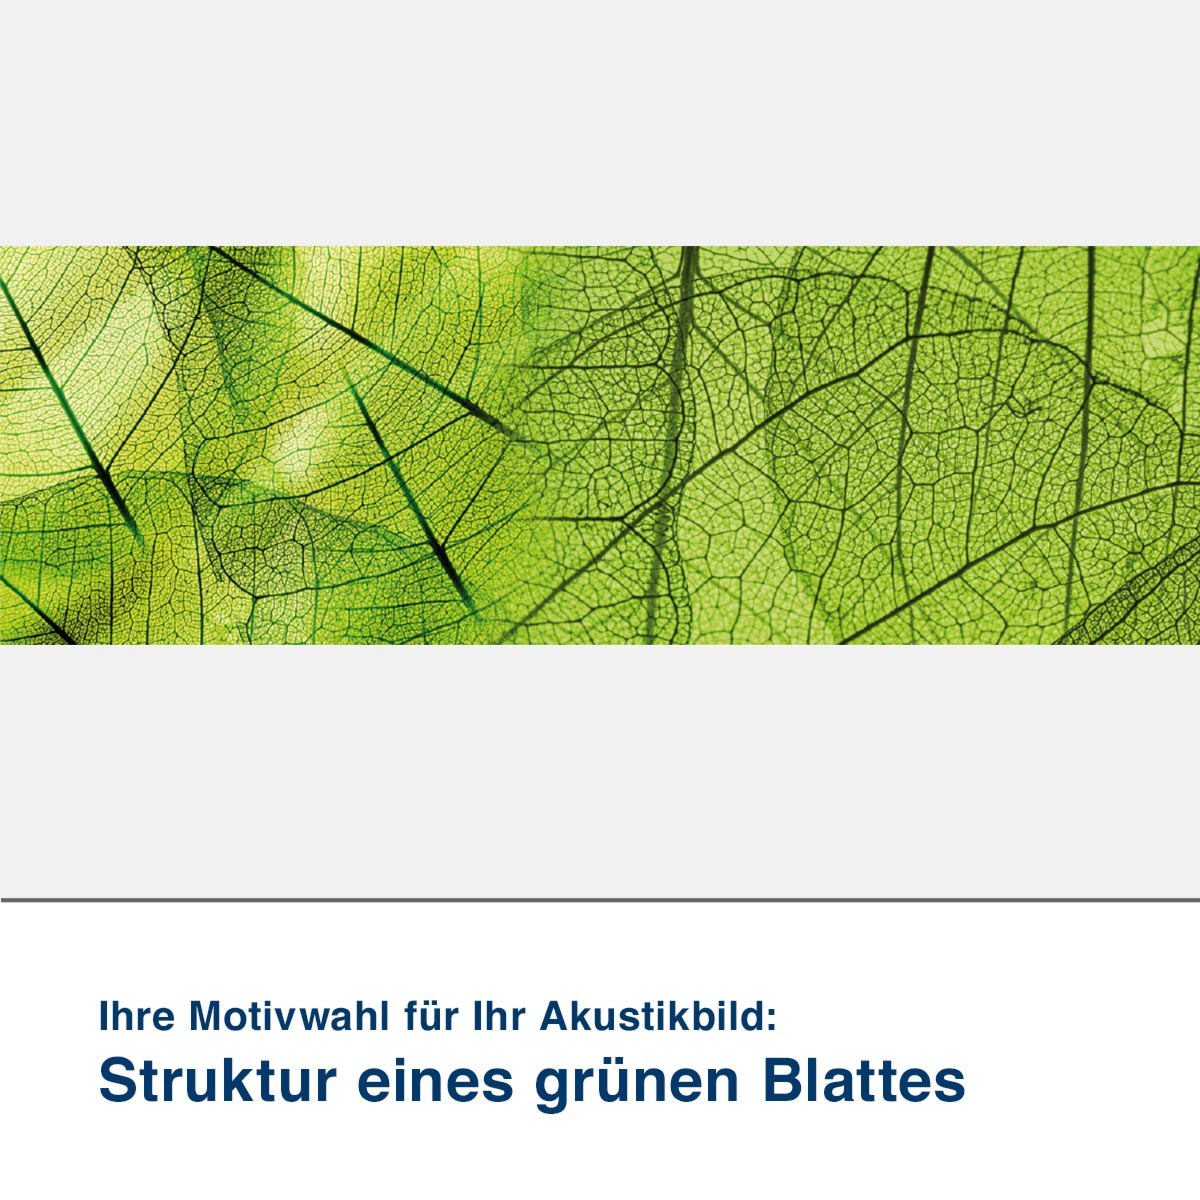 Akustikbild Motiv Struktur eines grünen Blattes